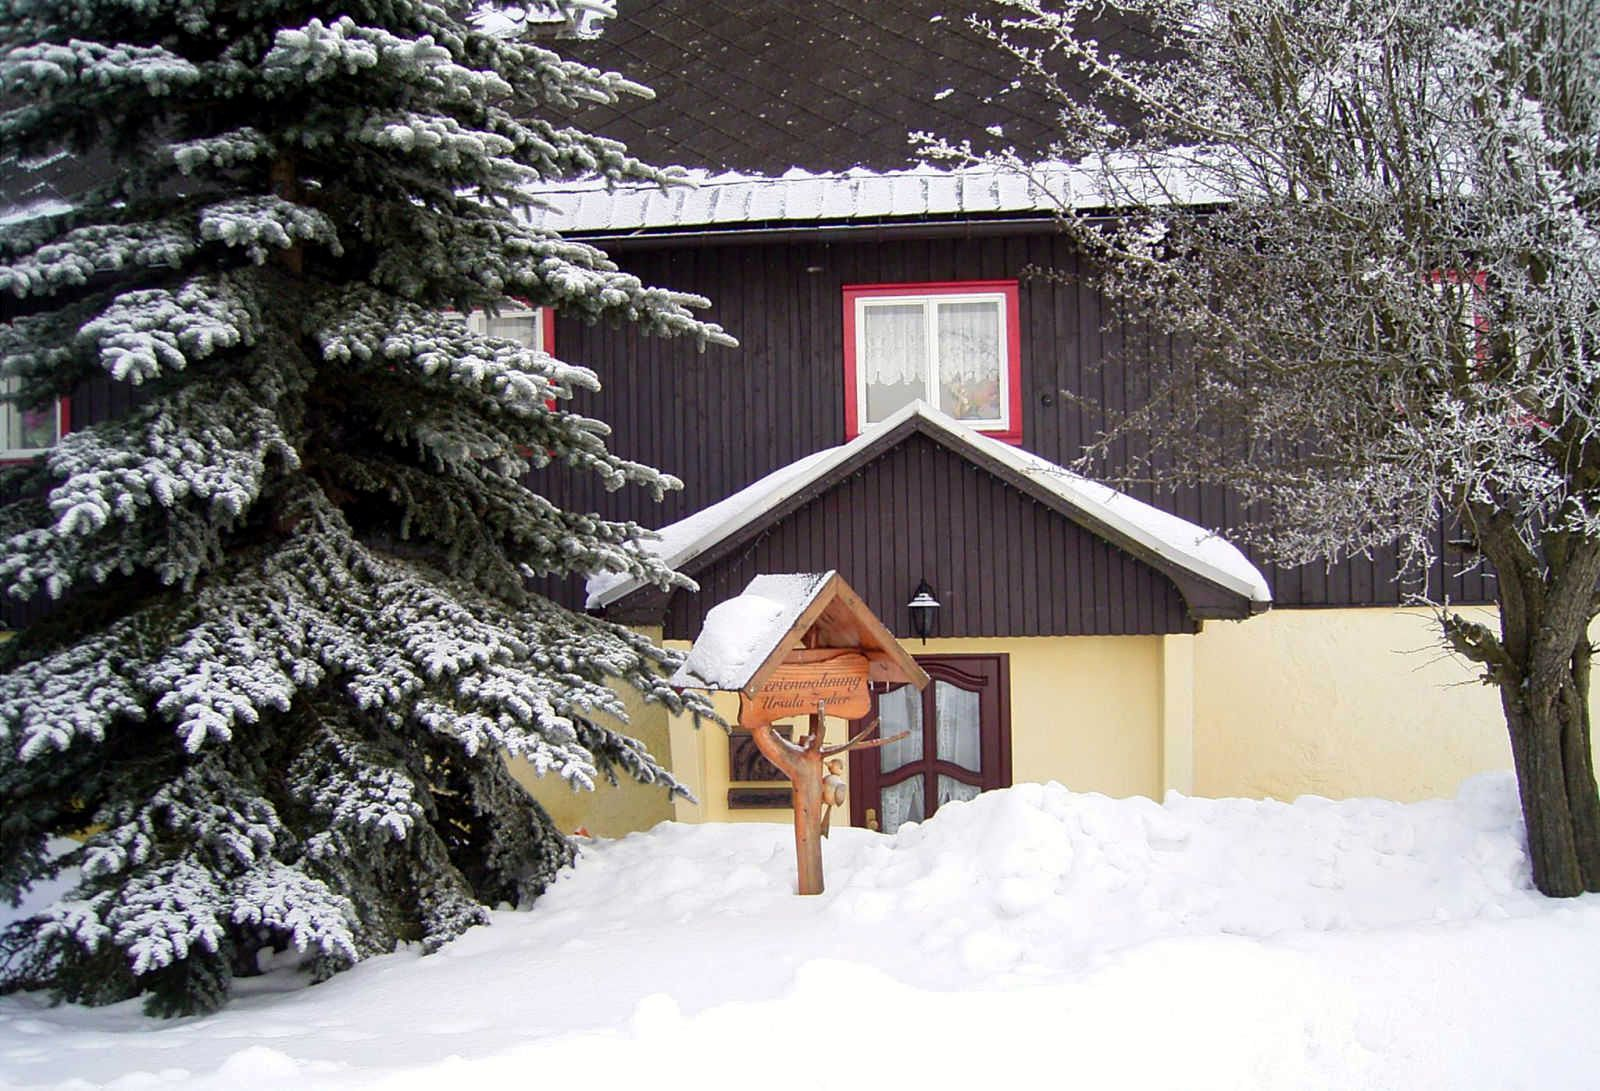 Gästehaus Zenker